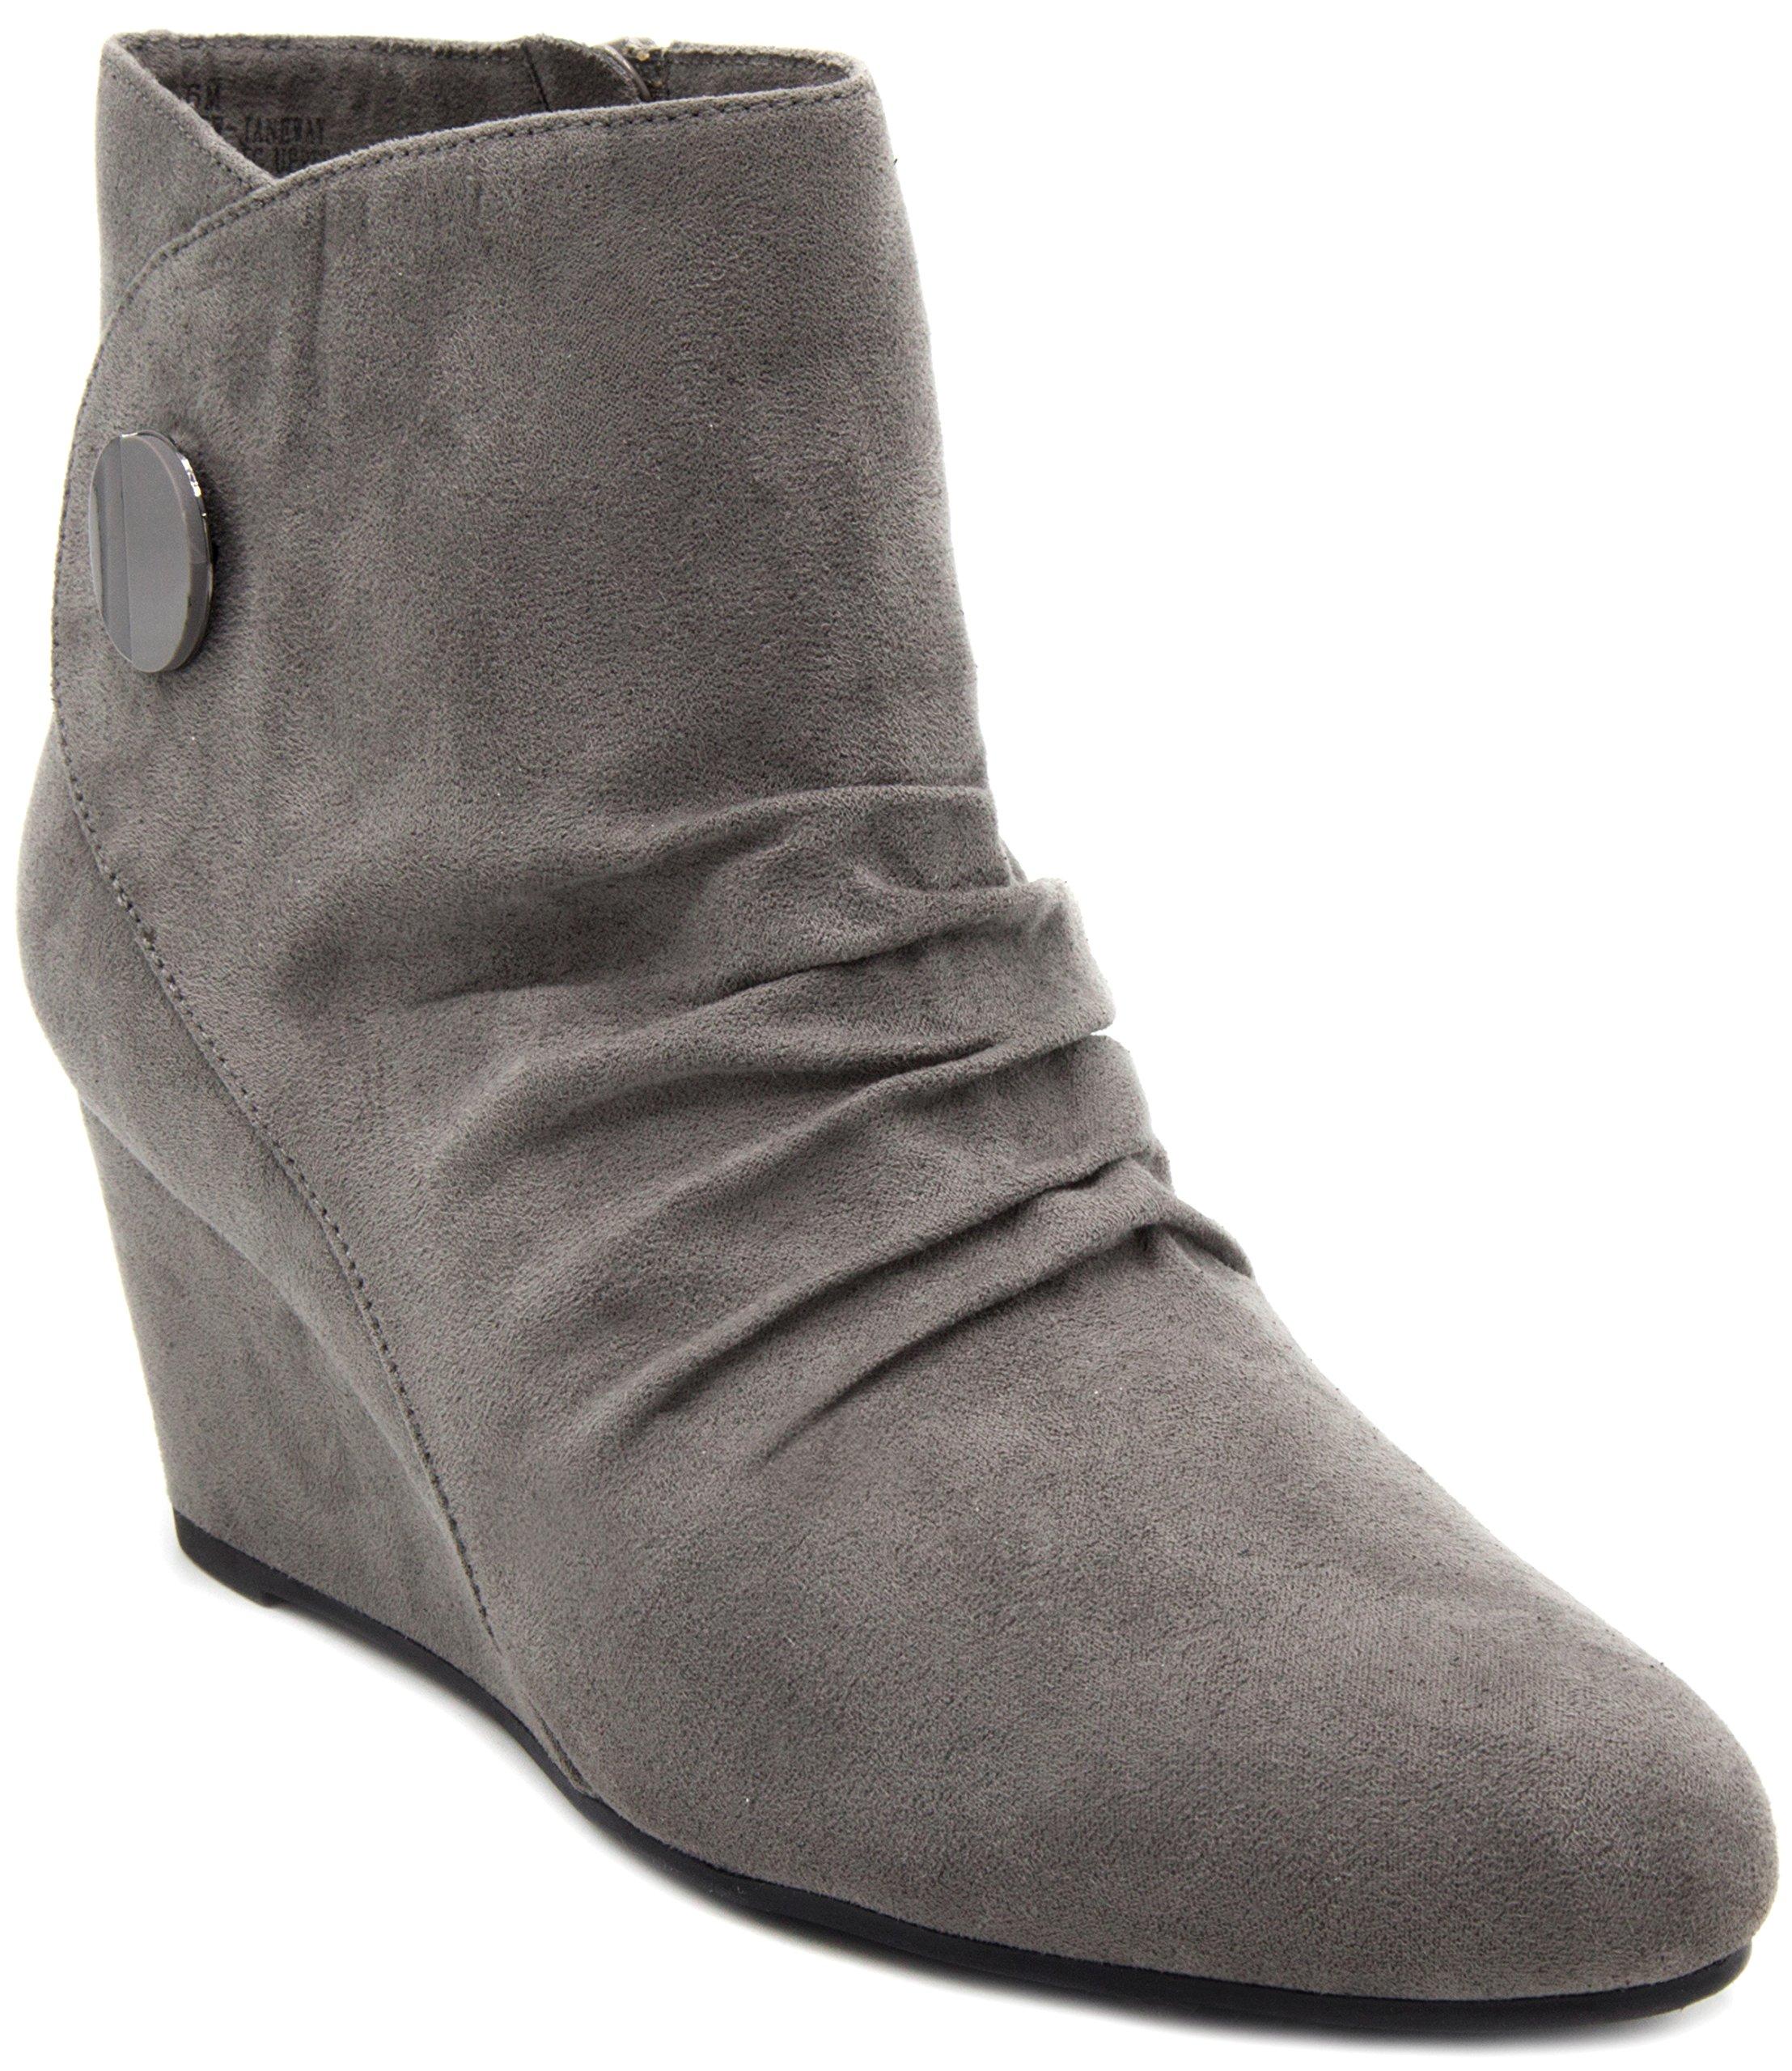 London Fog Womens Janeway Wedged Ankle Booties Grey 9.5 M US